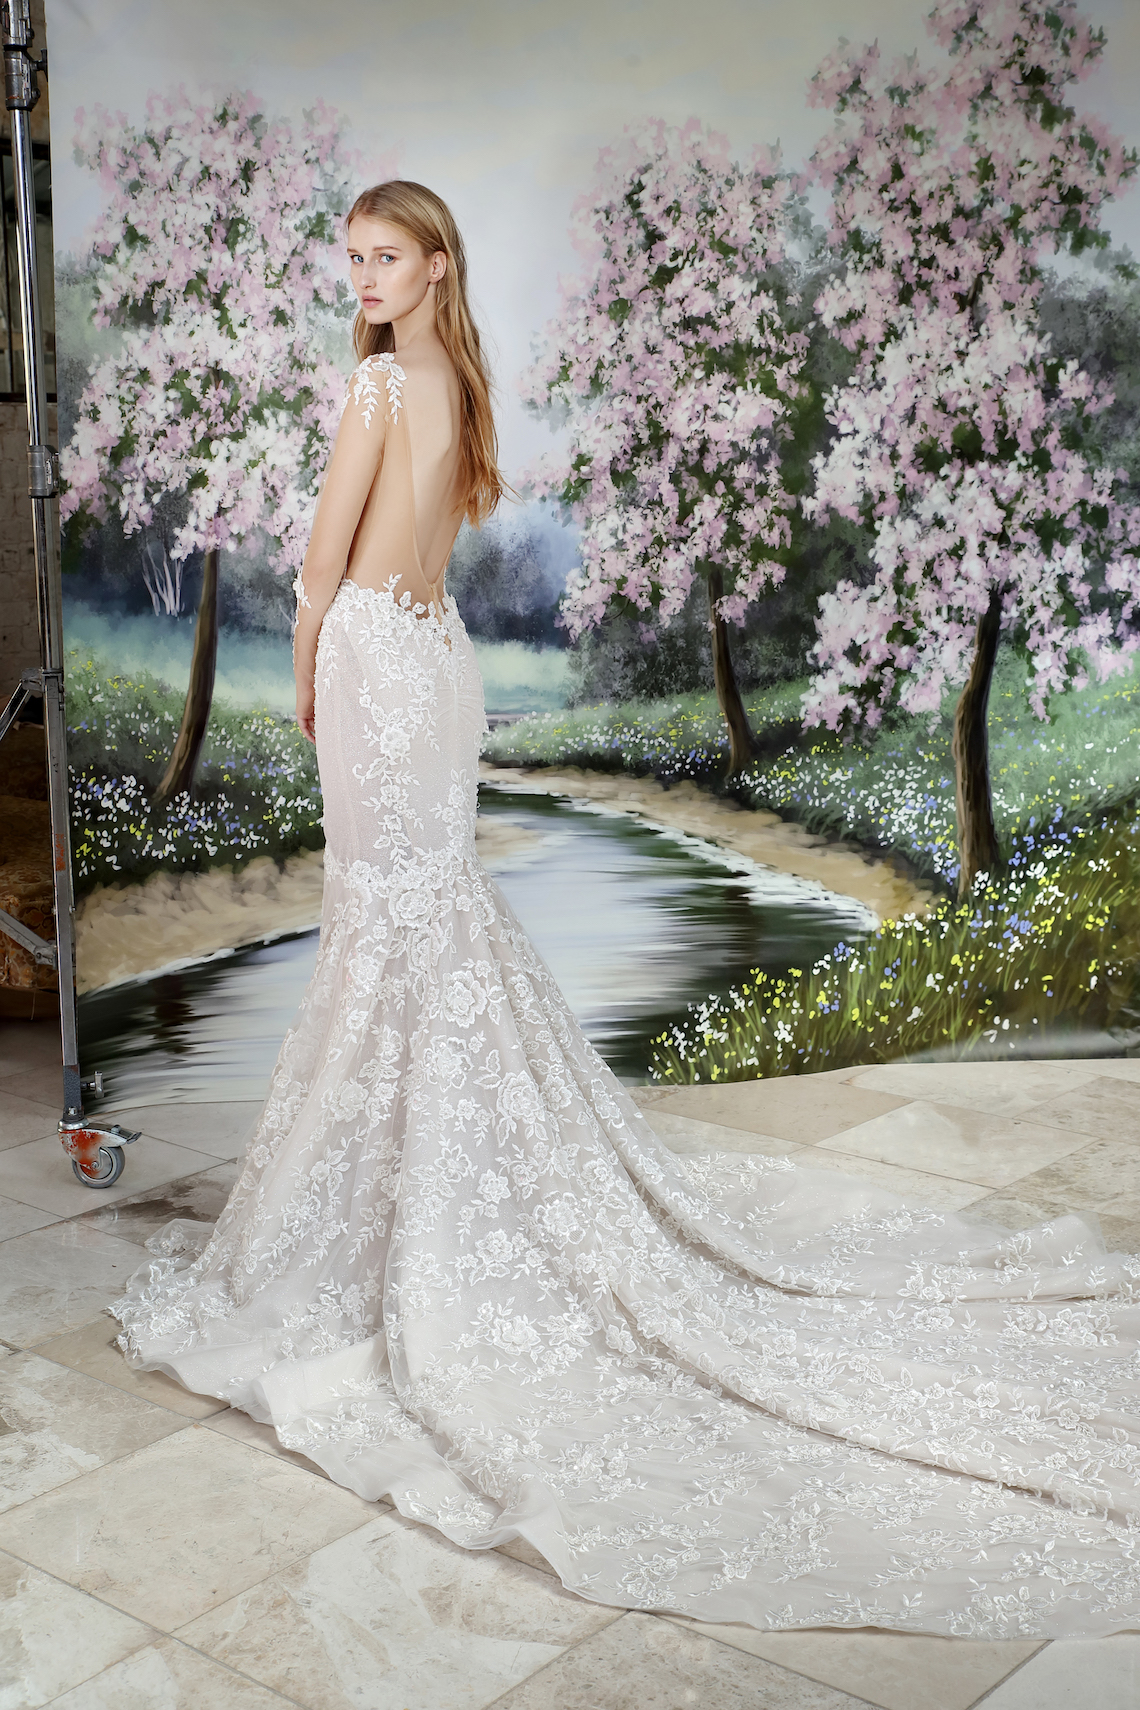 Galia Lahav Modern Fairytale-Inspired Wedding Dress Collection G-206 Back